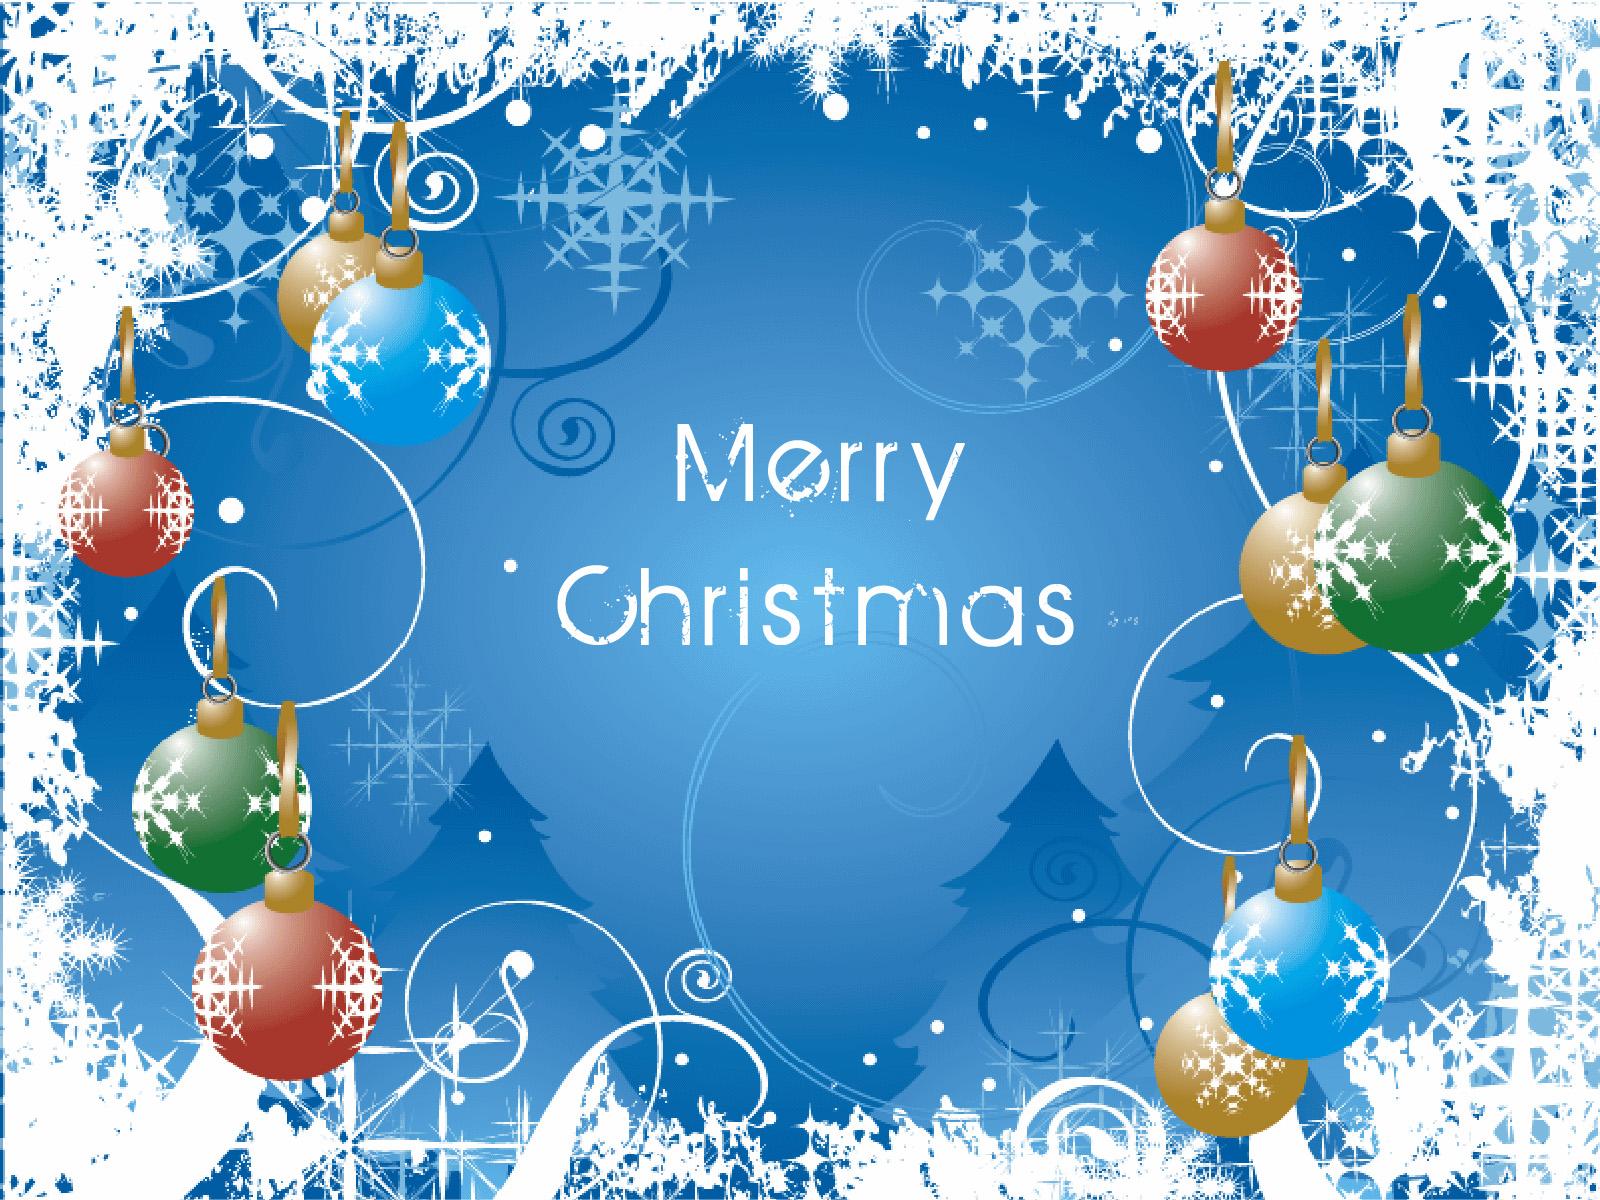 Greetings Card Wallpapers Desktop Merry Christmas Wallpapers 1600x1200